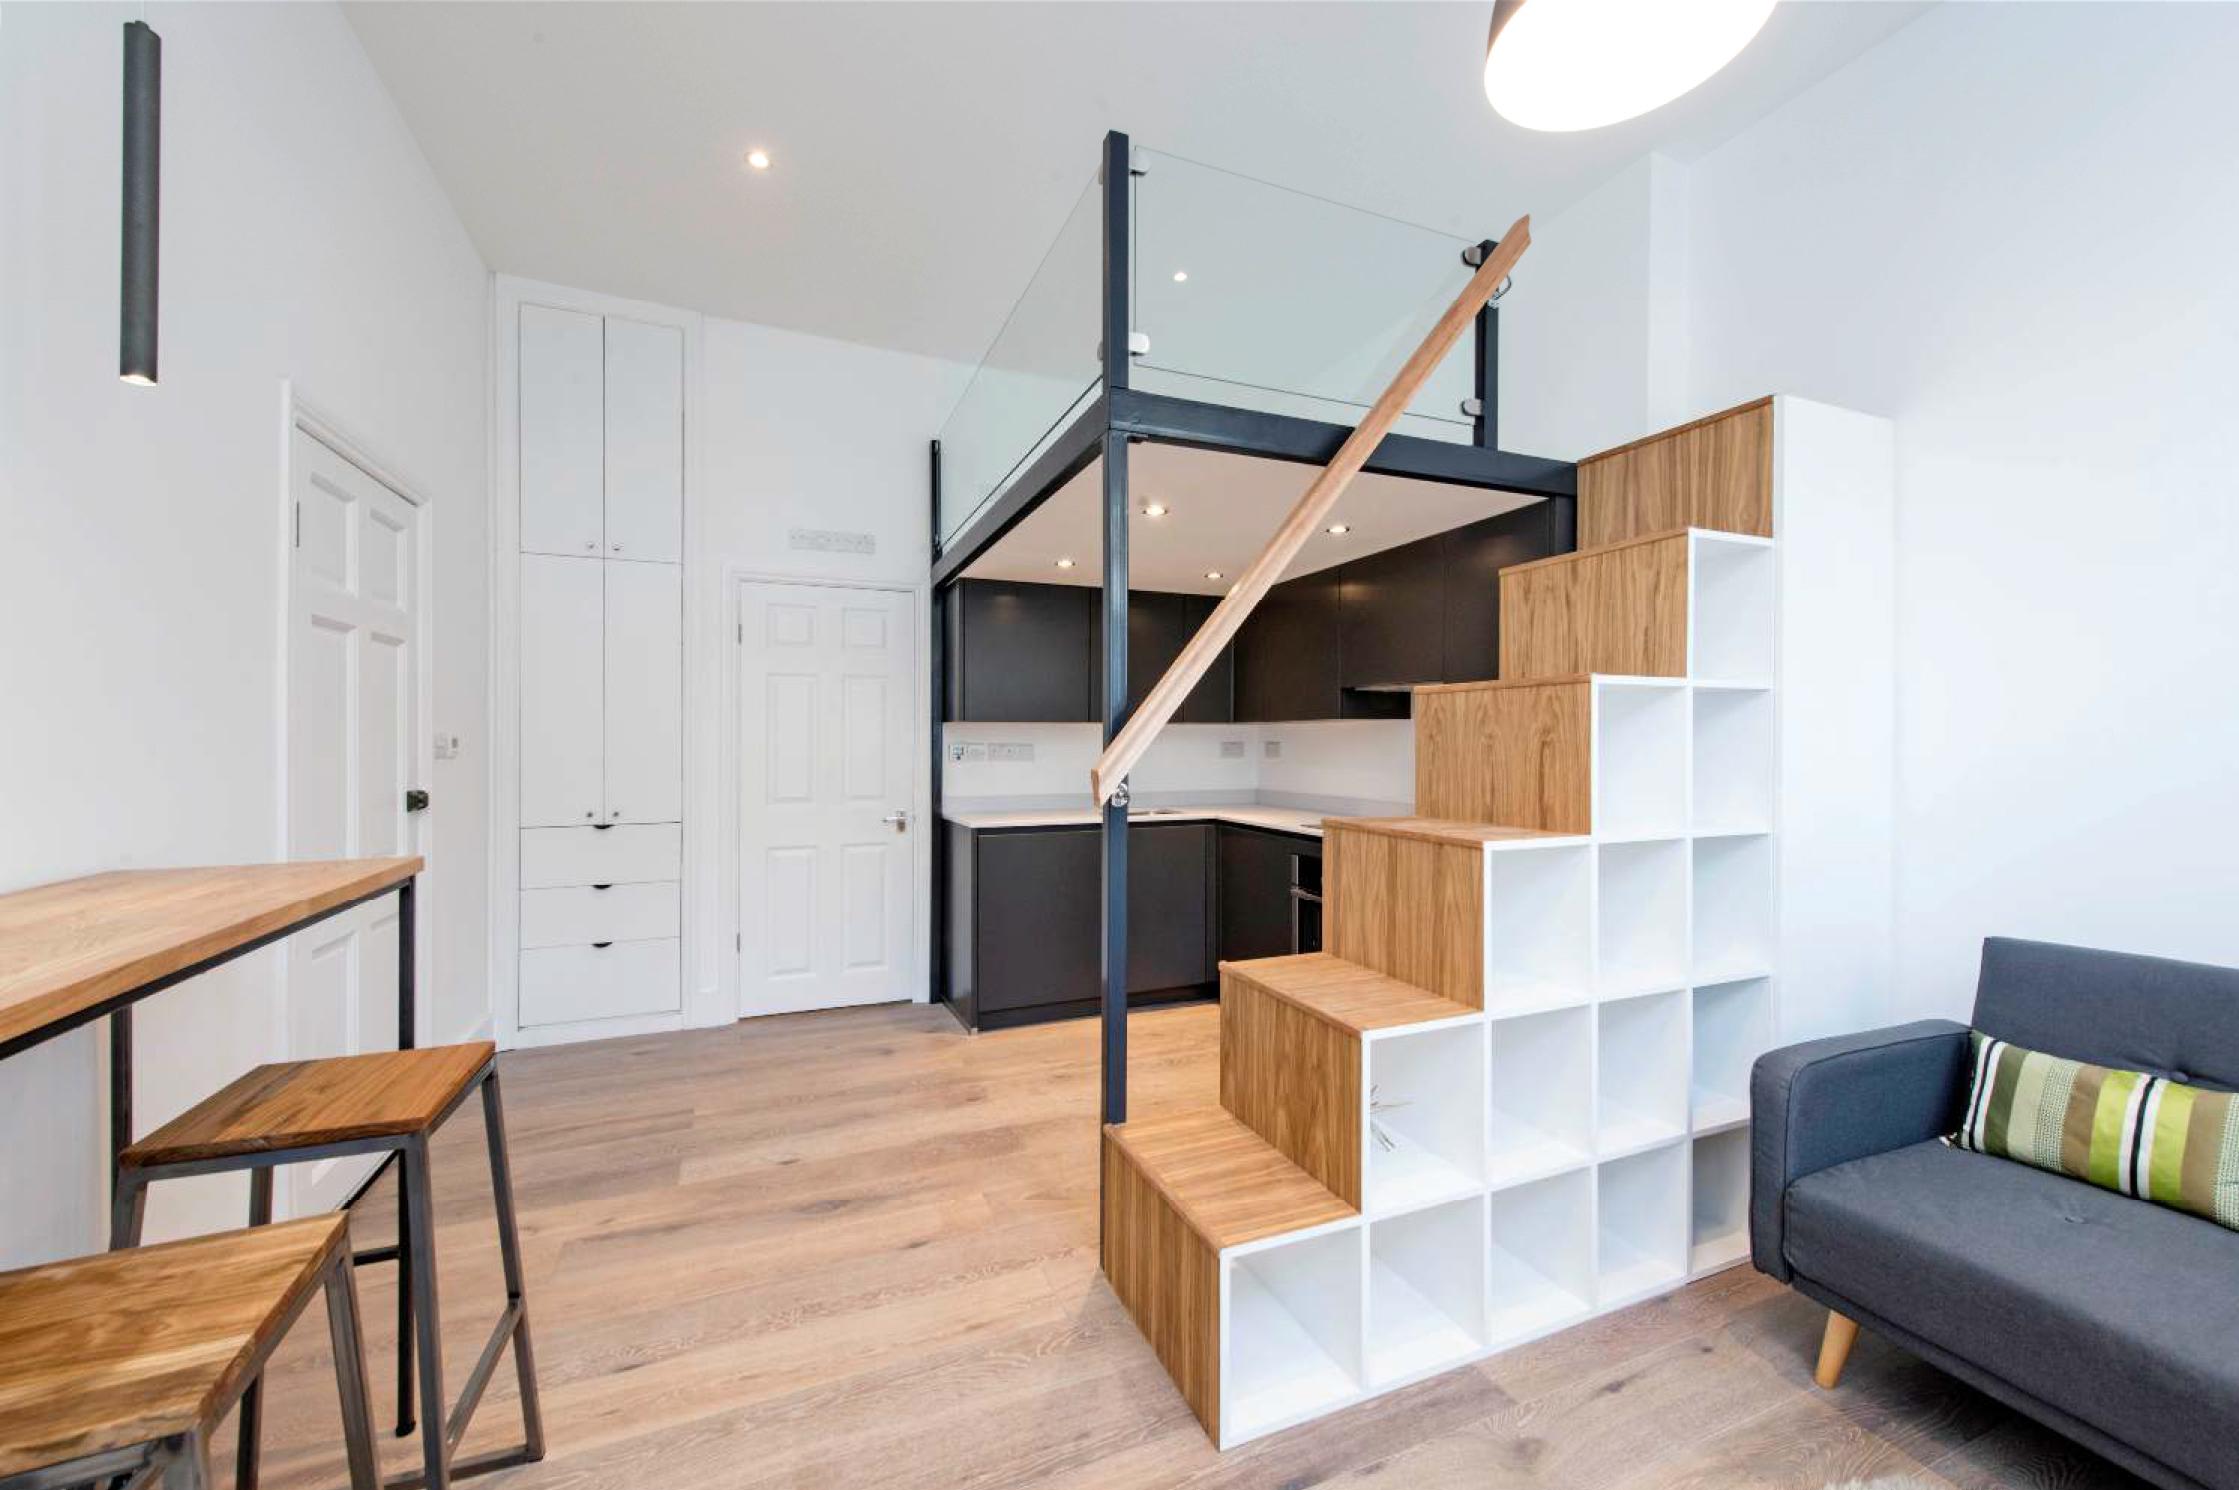 mezzanine-loft- stairs-storage-studio-flat-scandinavian-loft-clapham-london-55